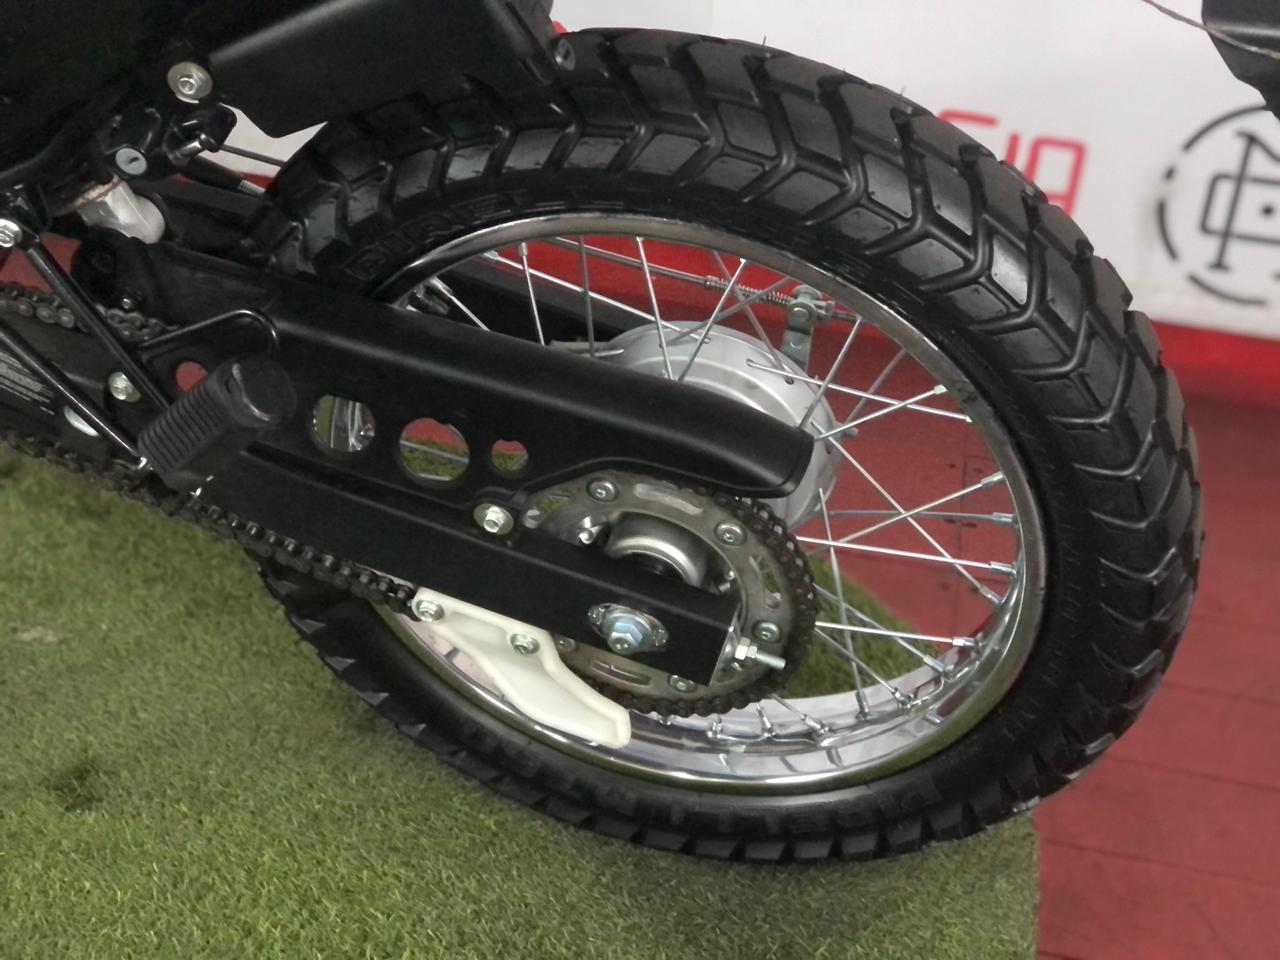 Honda - BROS 160